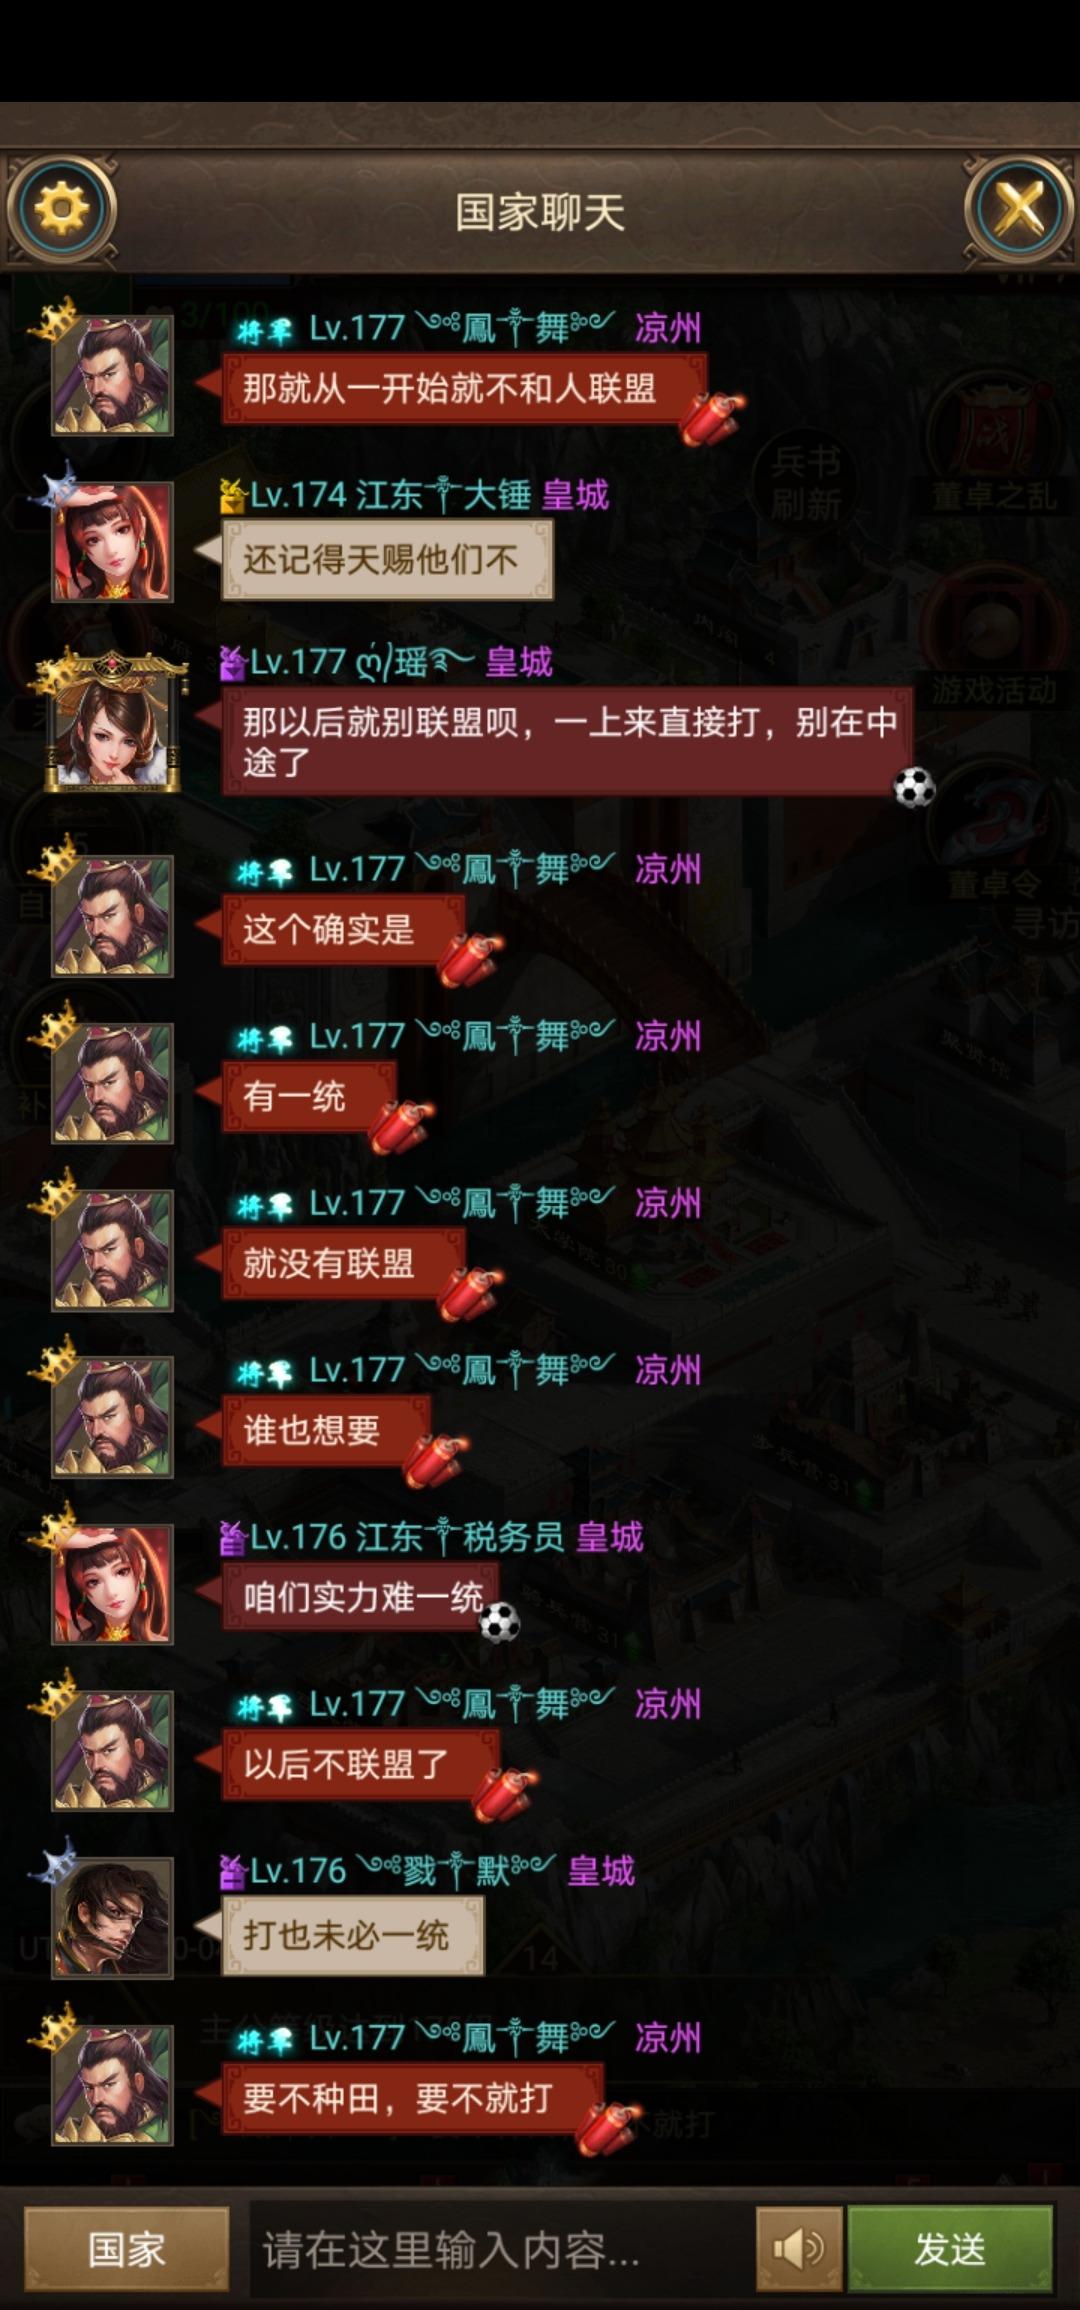 Screenshot_20200422_183329_com.jedigames.rxsg.luobo.jpg